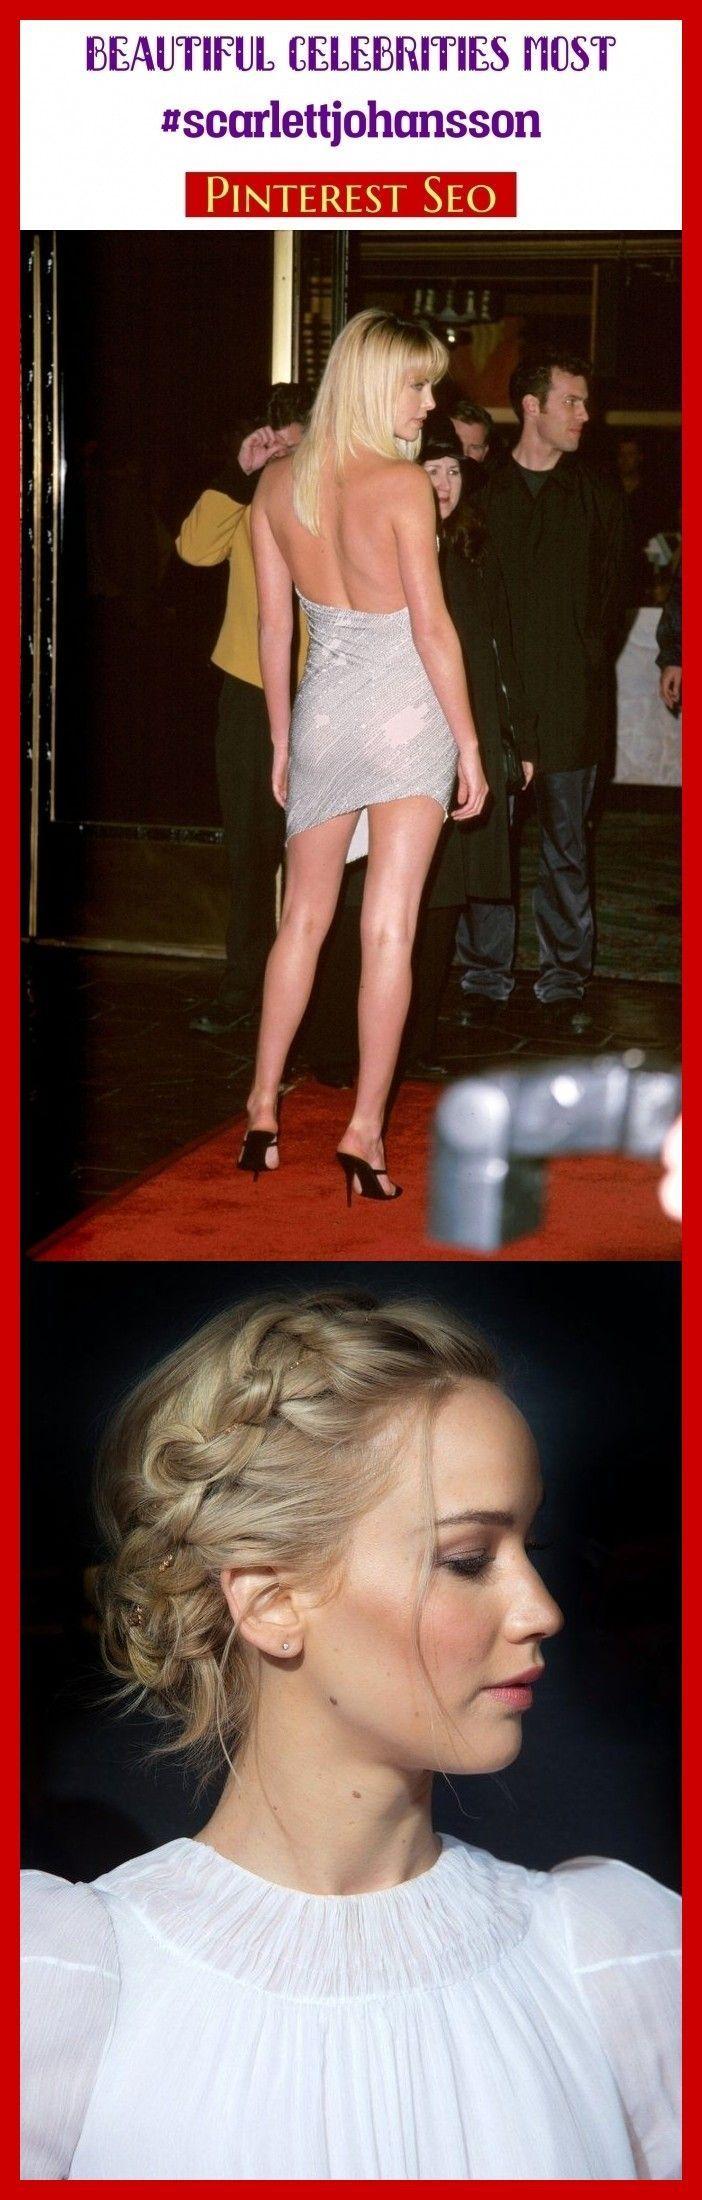 Photo of Beautiful celebrities more #scarlettjohansson #seotrends #trending. beautiful ce …, #beautifulce …